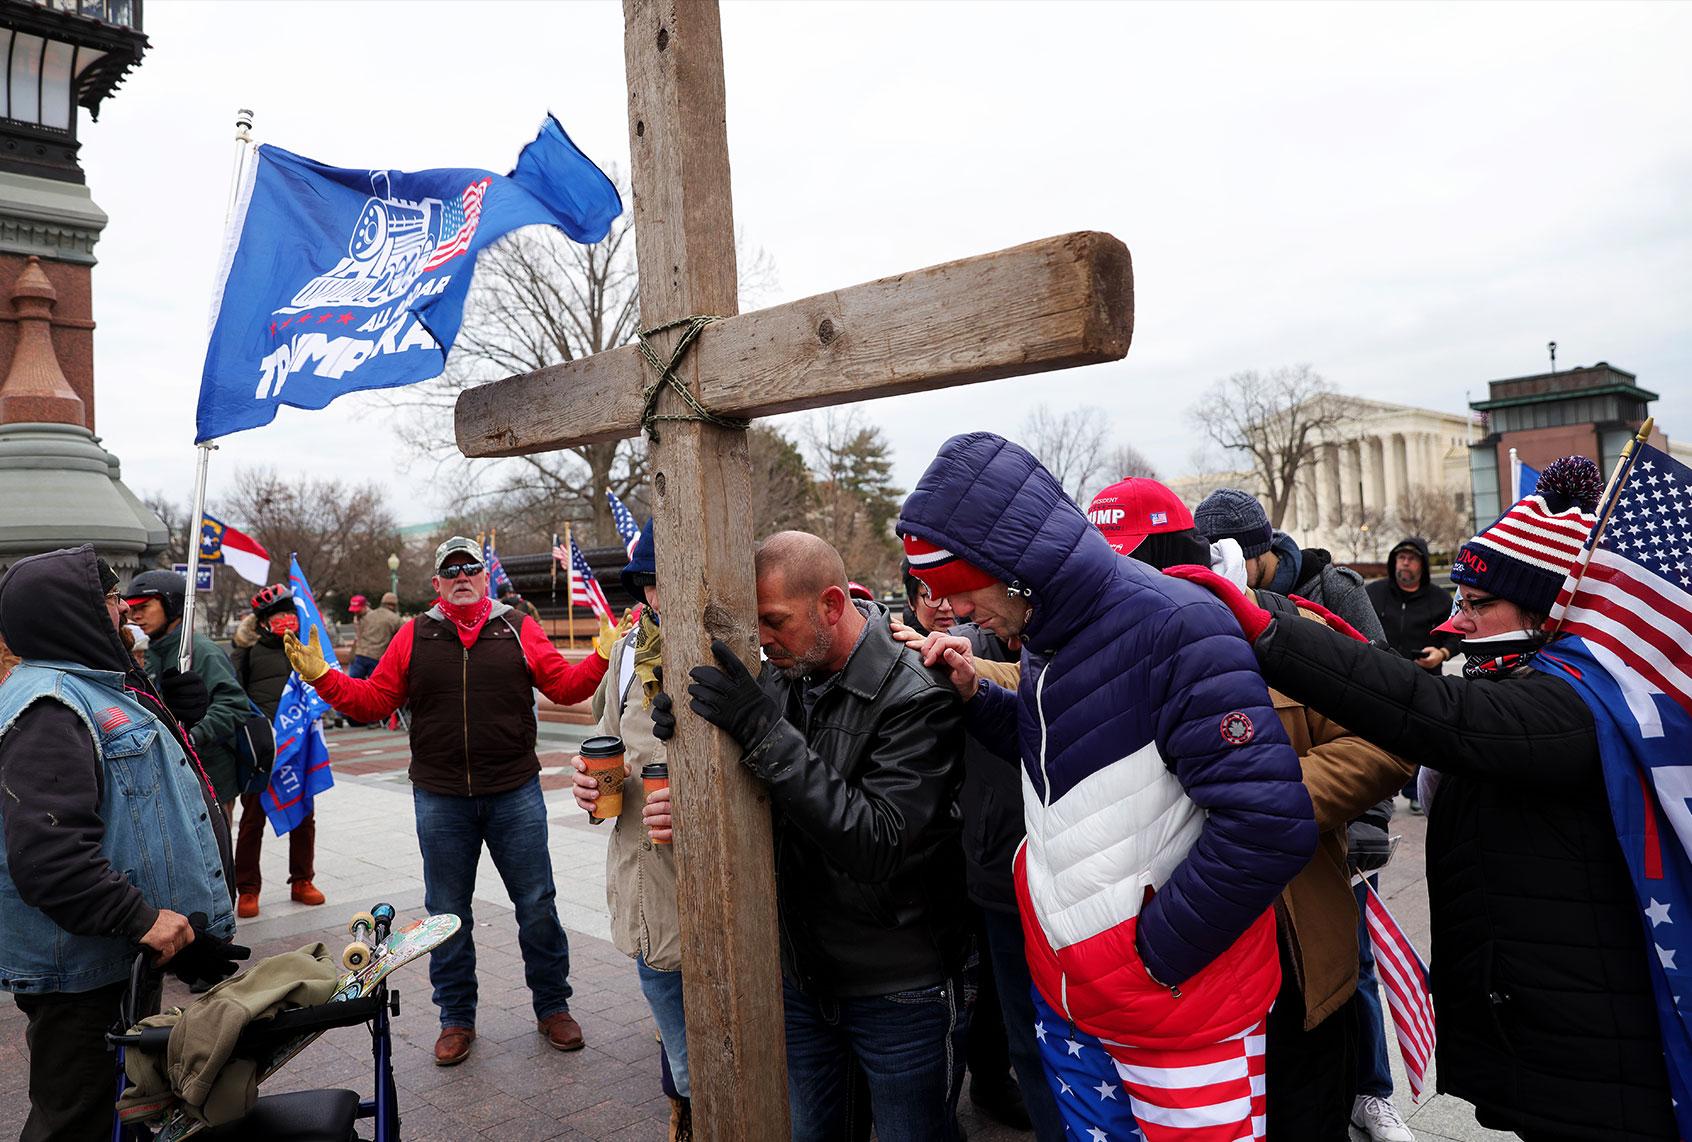 trump-supporters-praying-christian-cross